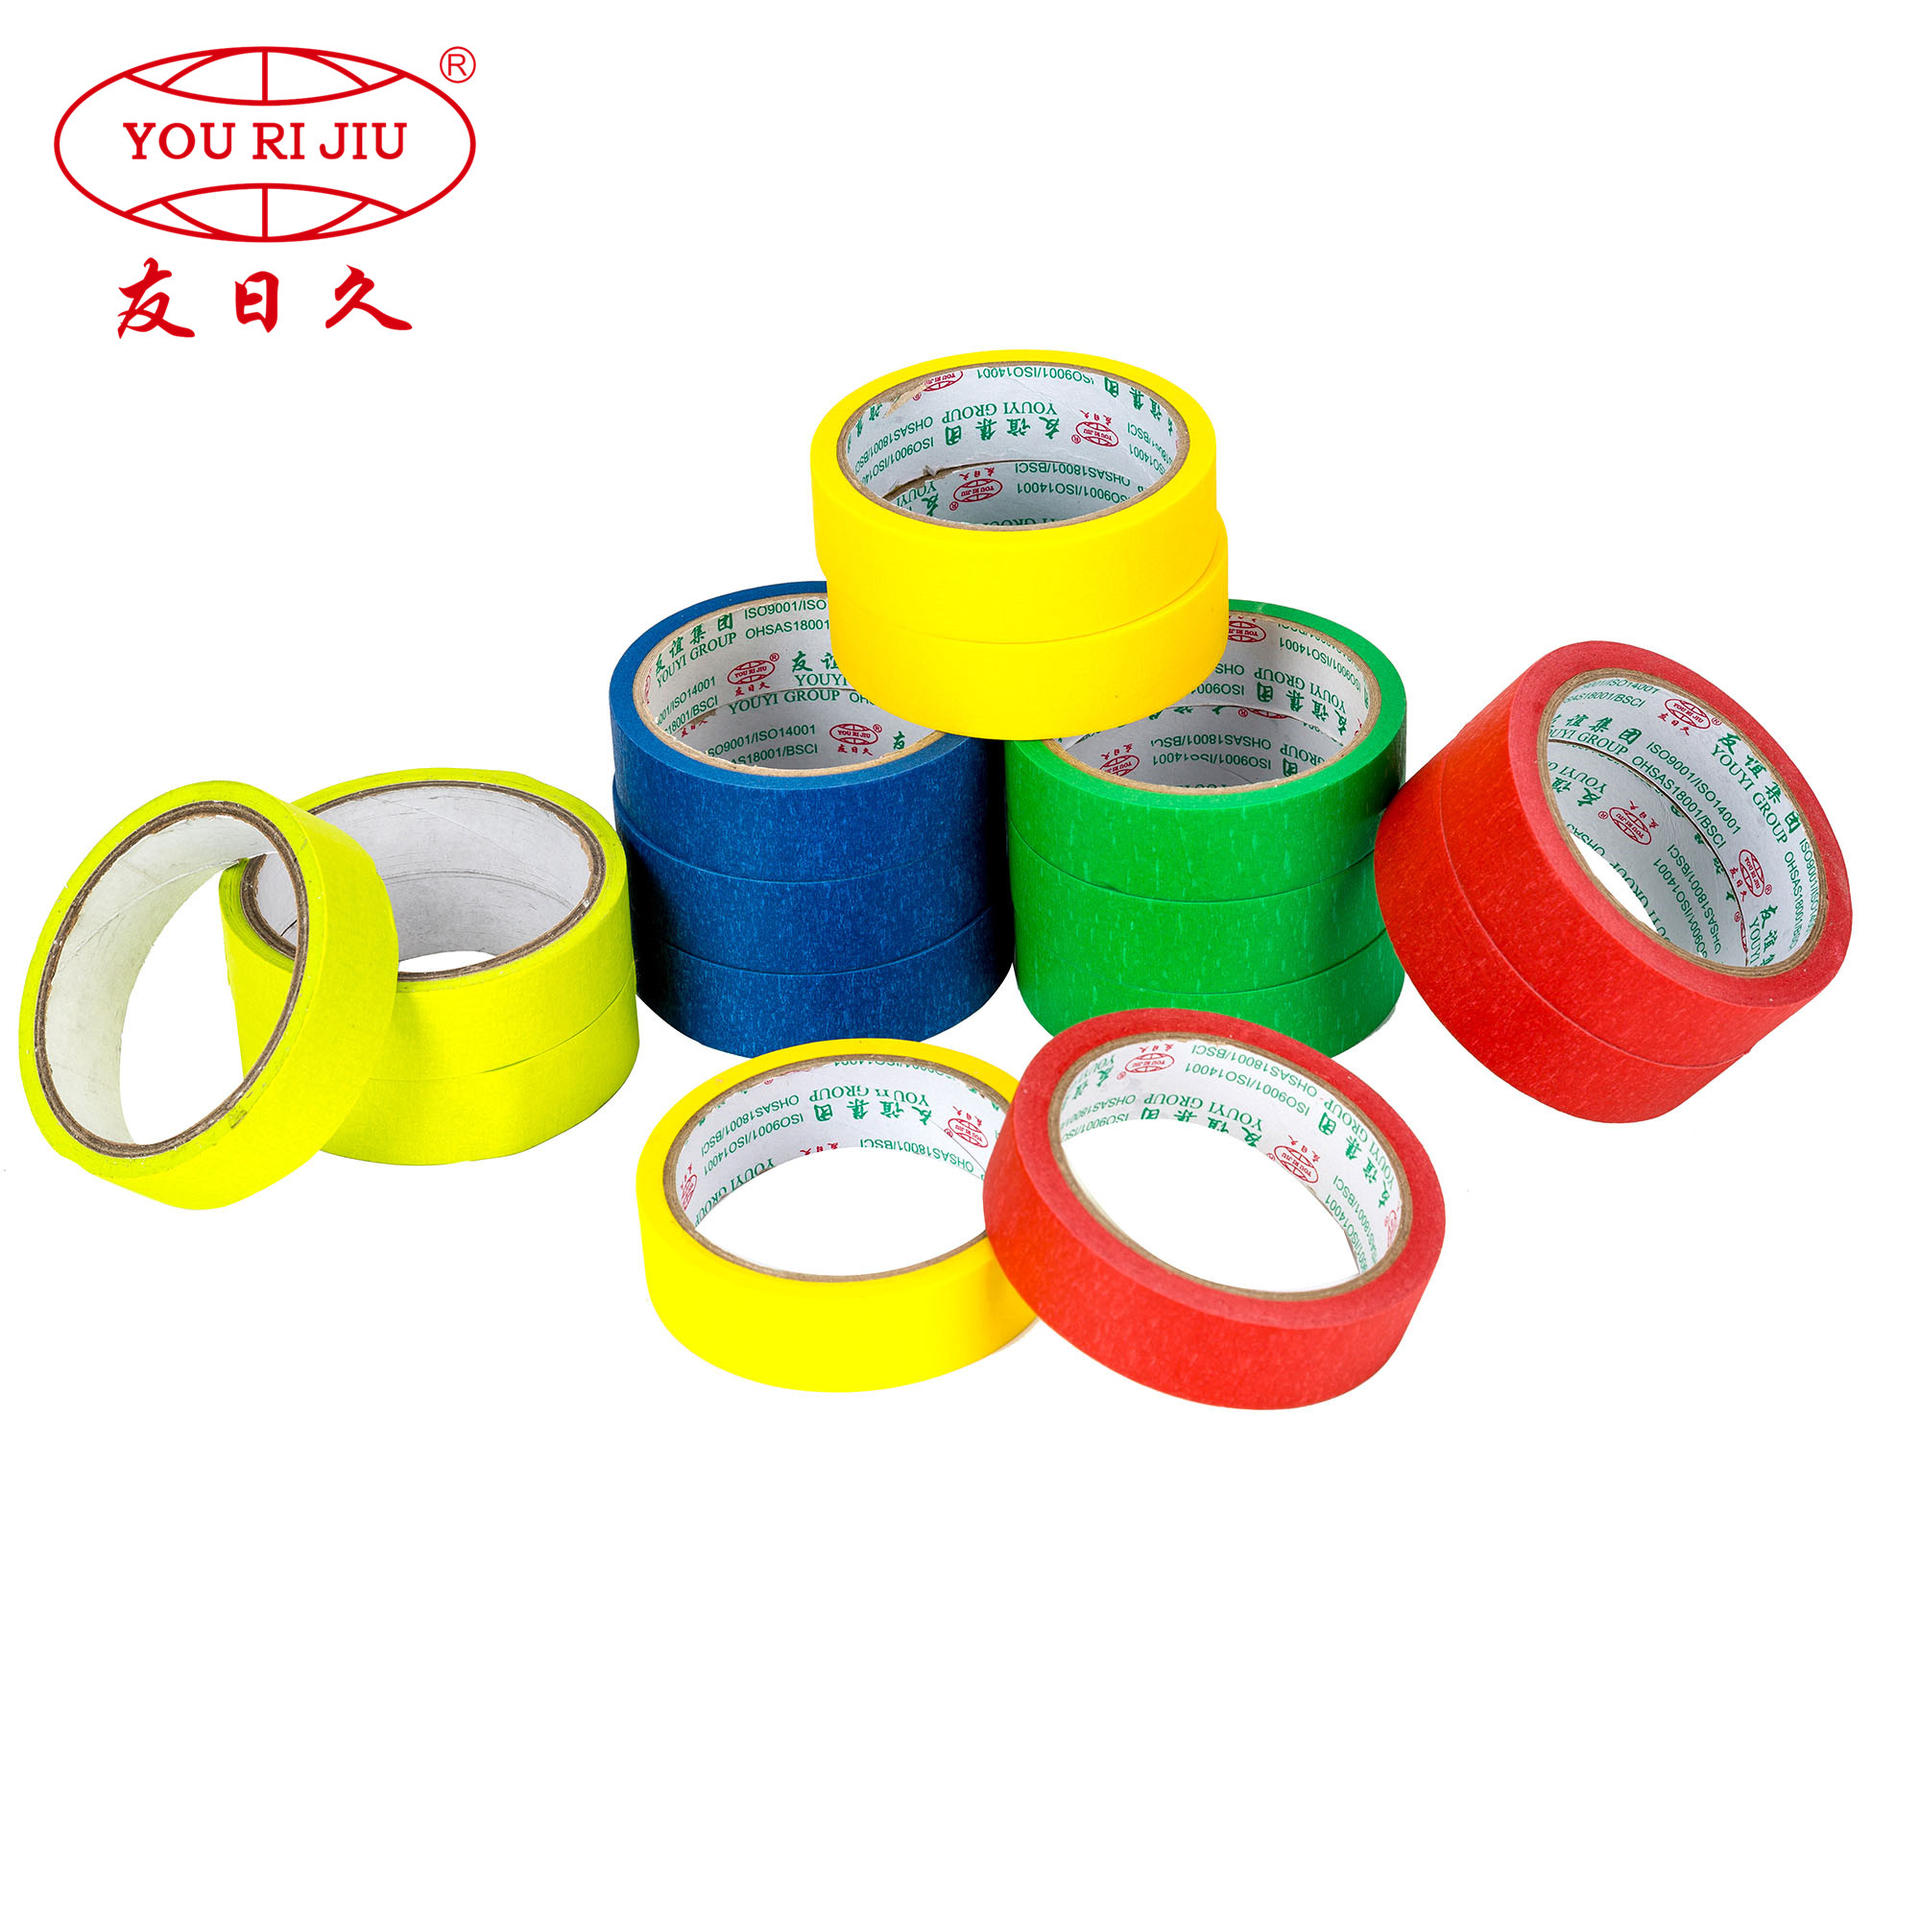 Green Masking Tape 60 degree general purpose jumbo roll finish roll